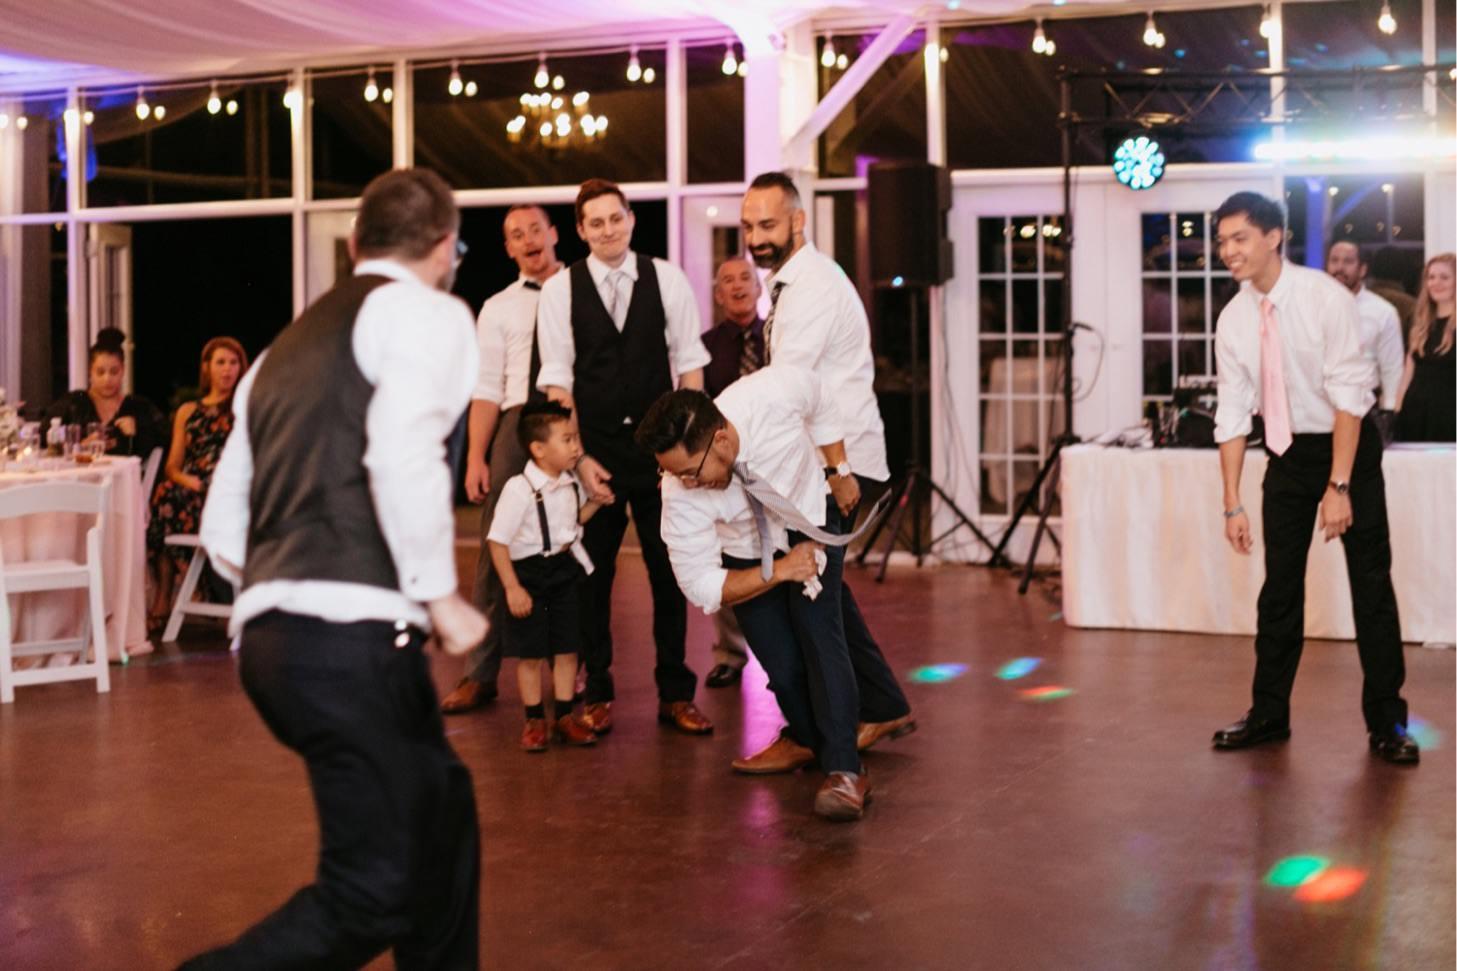 ritz-charles-wedding-reception-downtown-indianapolis-wedding-photographer080.JPG